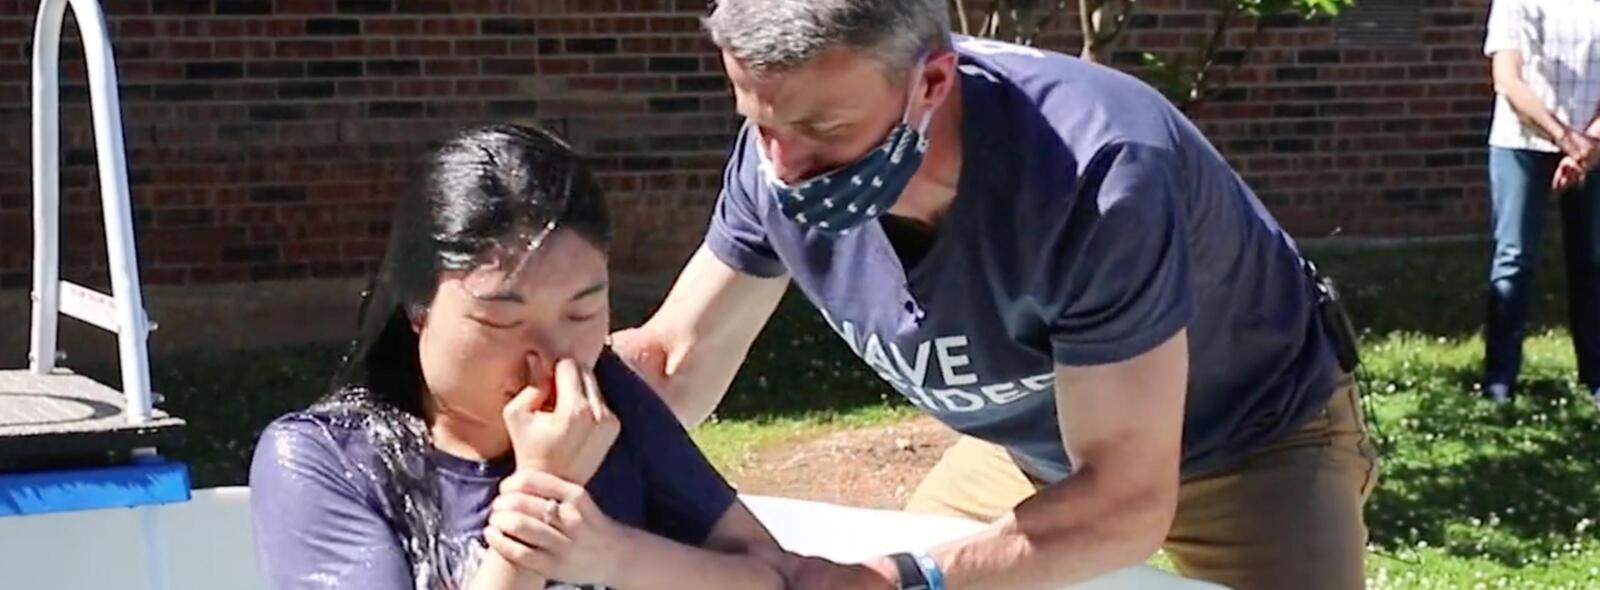 Full baptism Cindy – COVID-19 Times